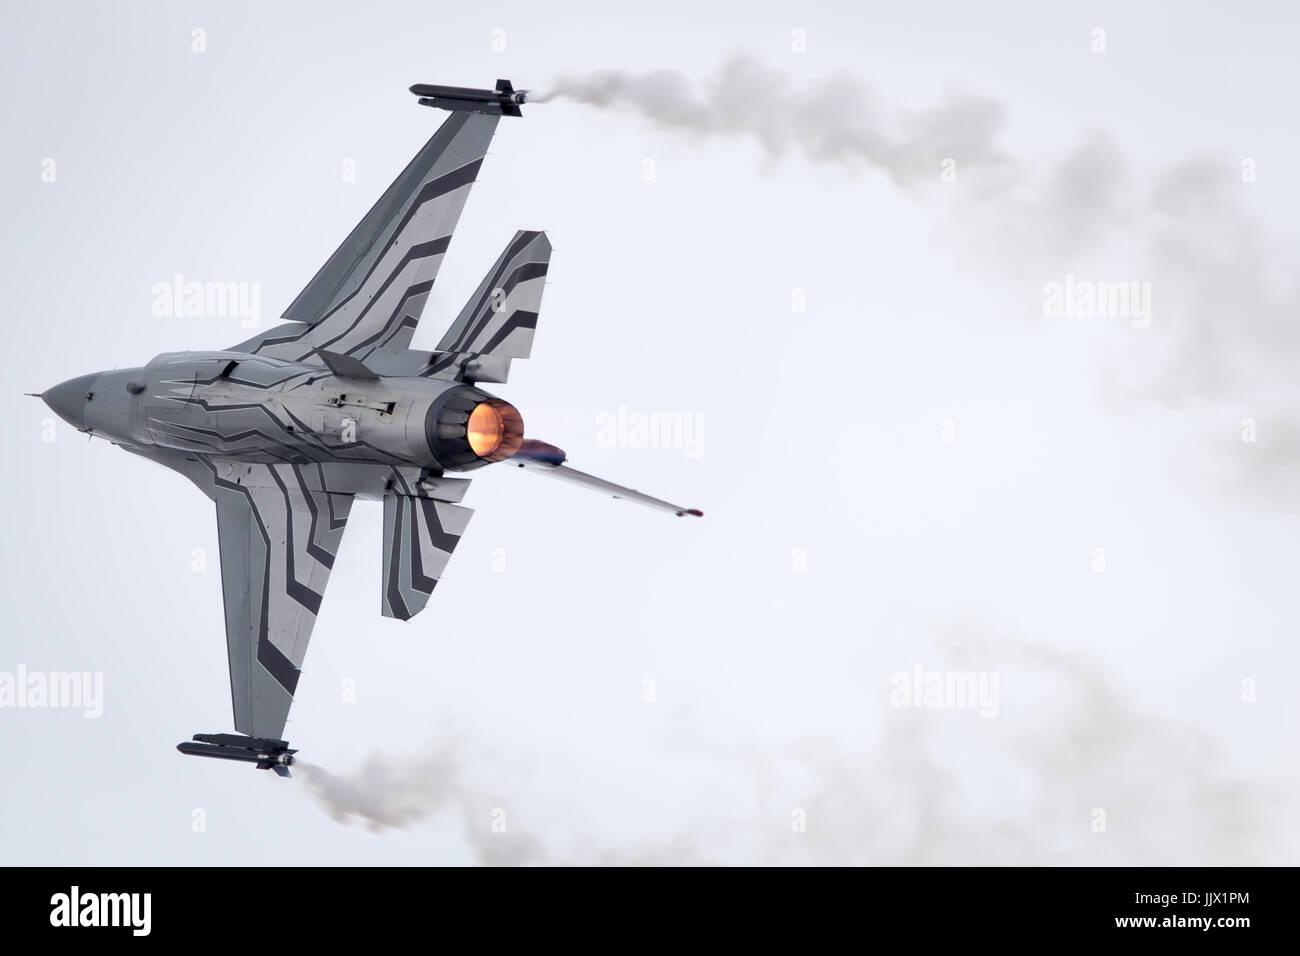 Belgian Air Force Lockheed Martin General Dynamics F-16 Fighting Falcon performing its Aerobatic Display at Fairford - Stock Image